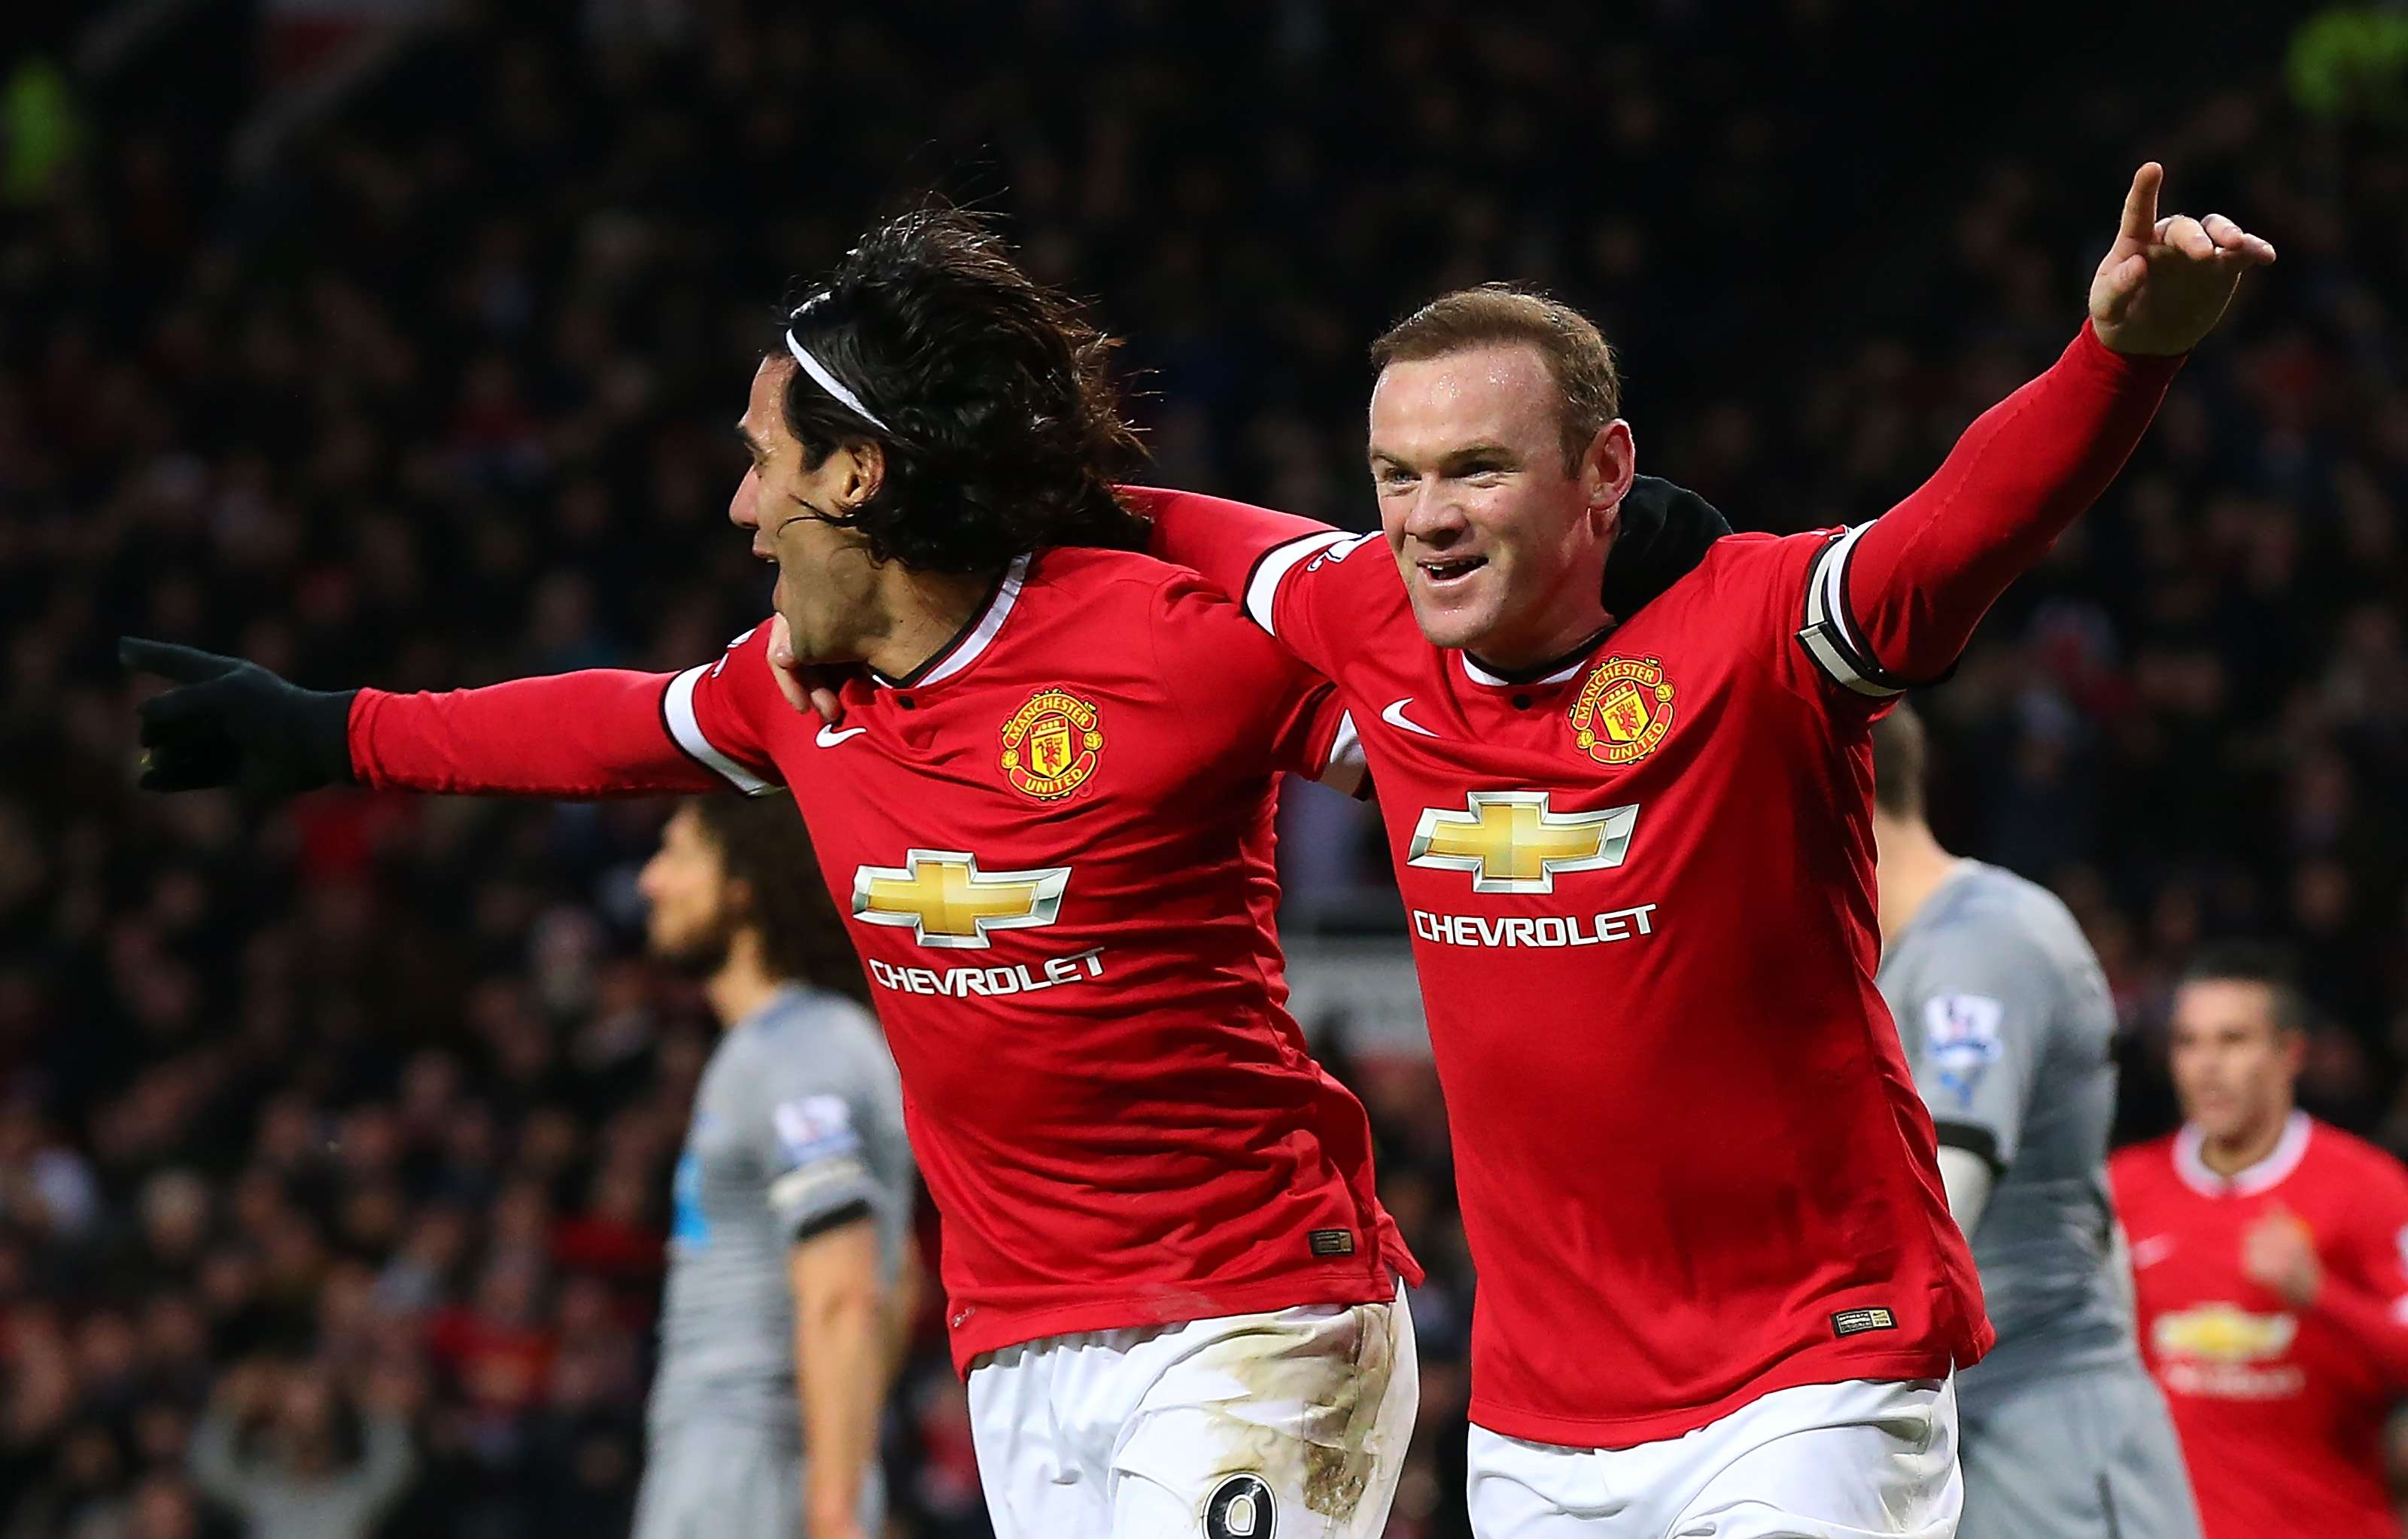 Rooney y Falcao festejan la victoria. Foto: Getty Images